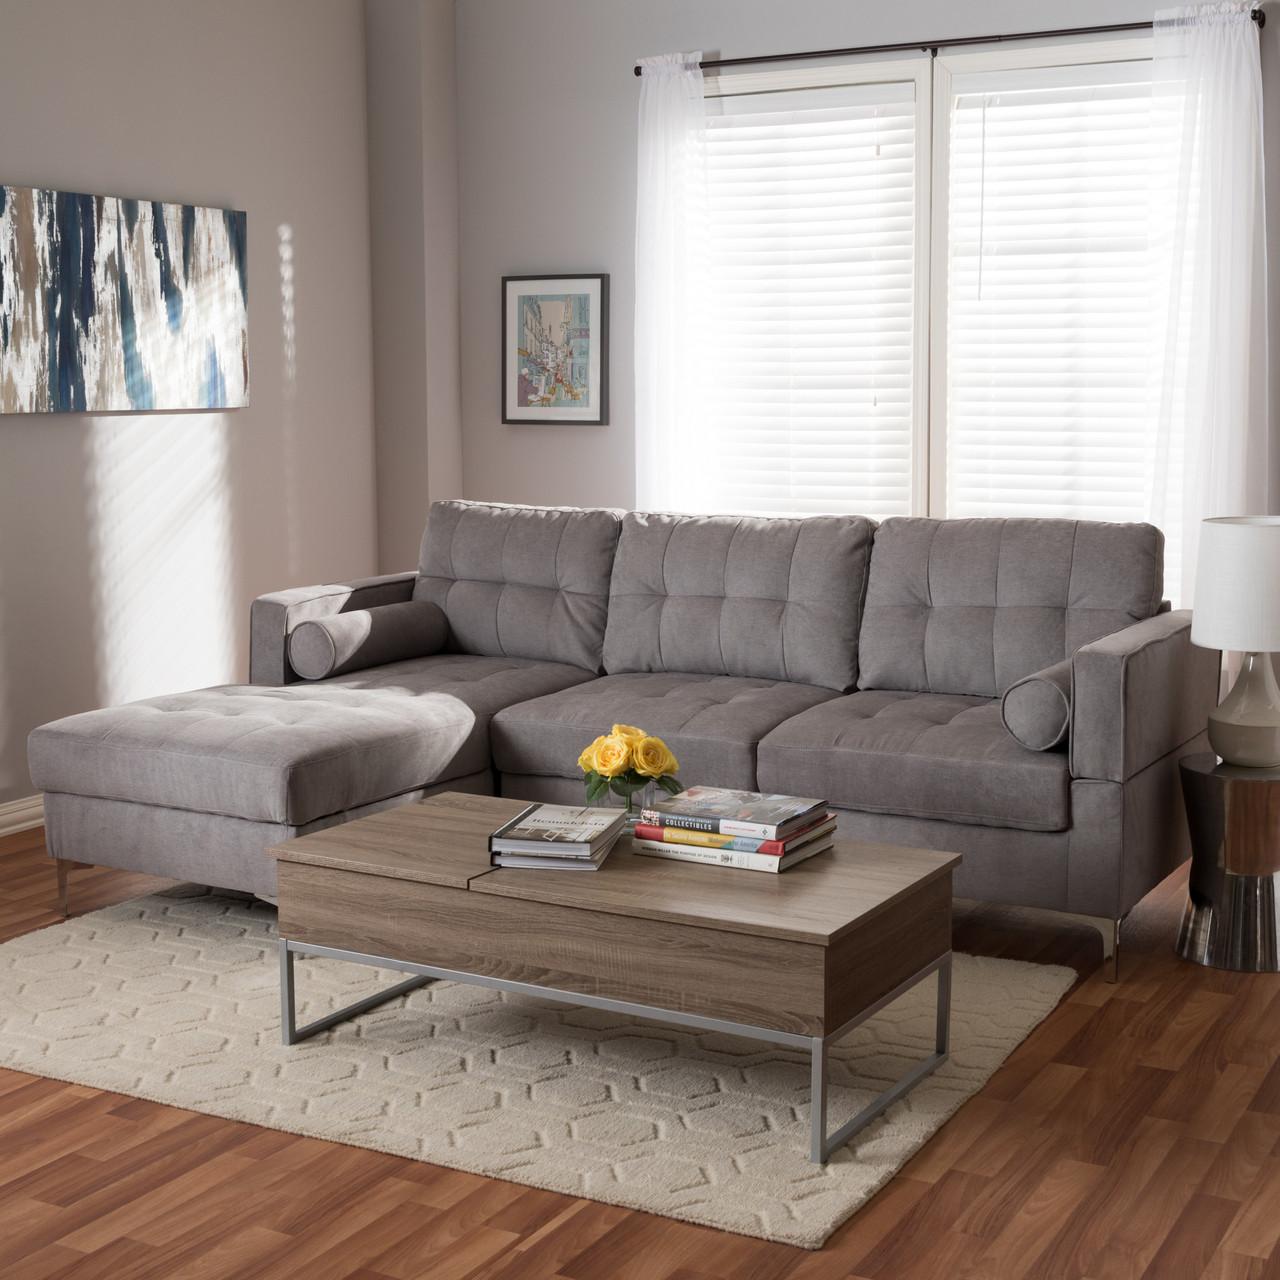 Baxton Studio Mireille Modern And Contemporary Light Grey Fabric